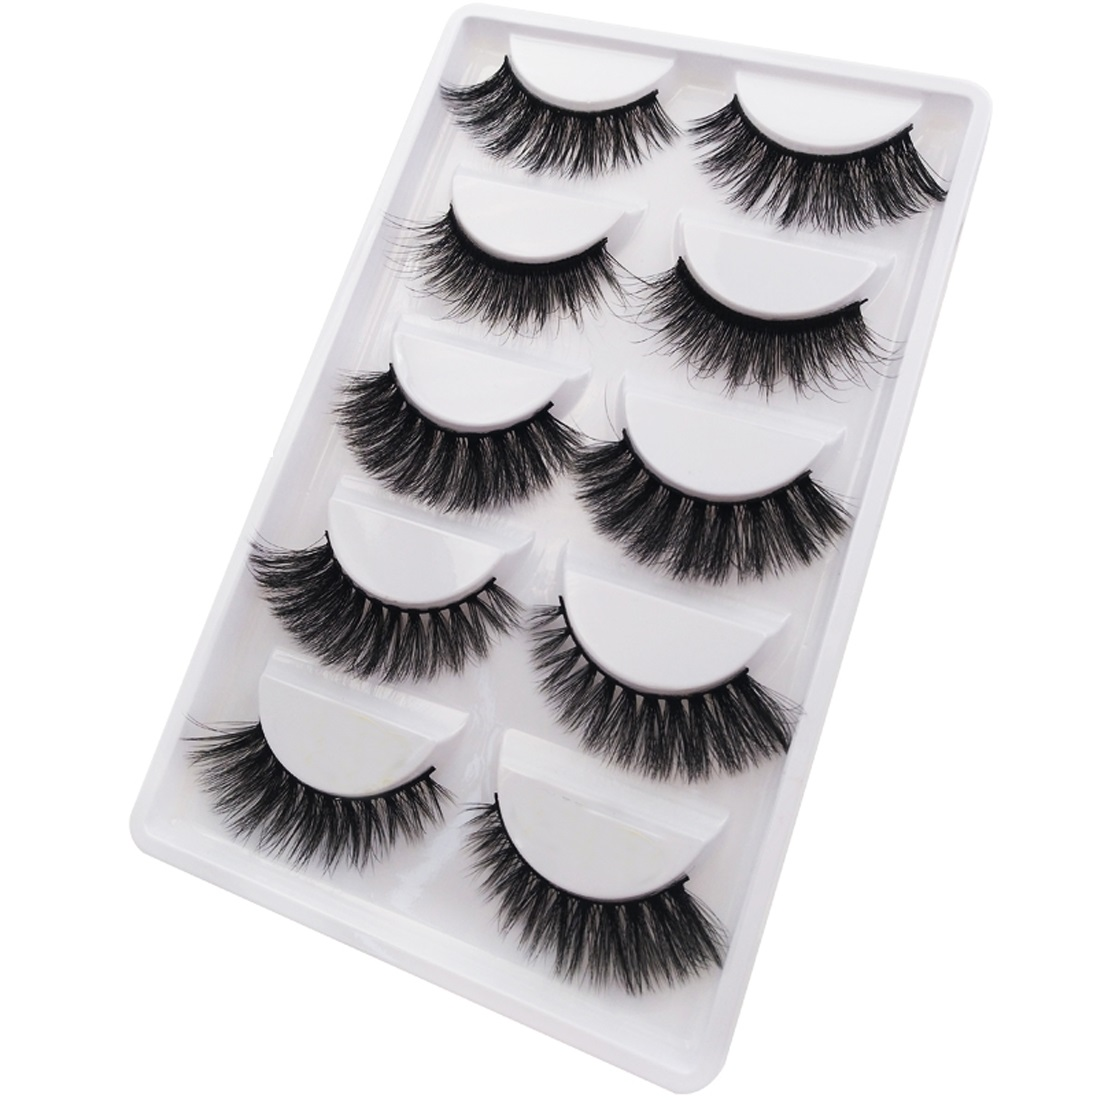 4bc425f03dd DAODER 3D Mink Eyelashes